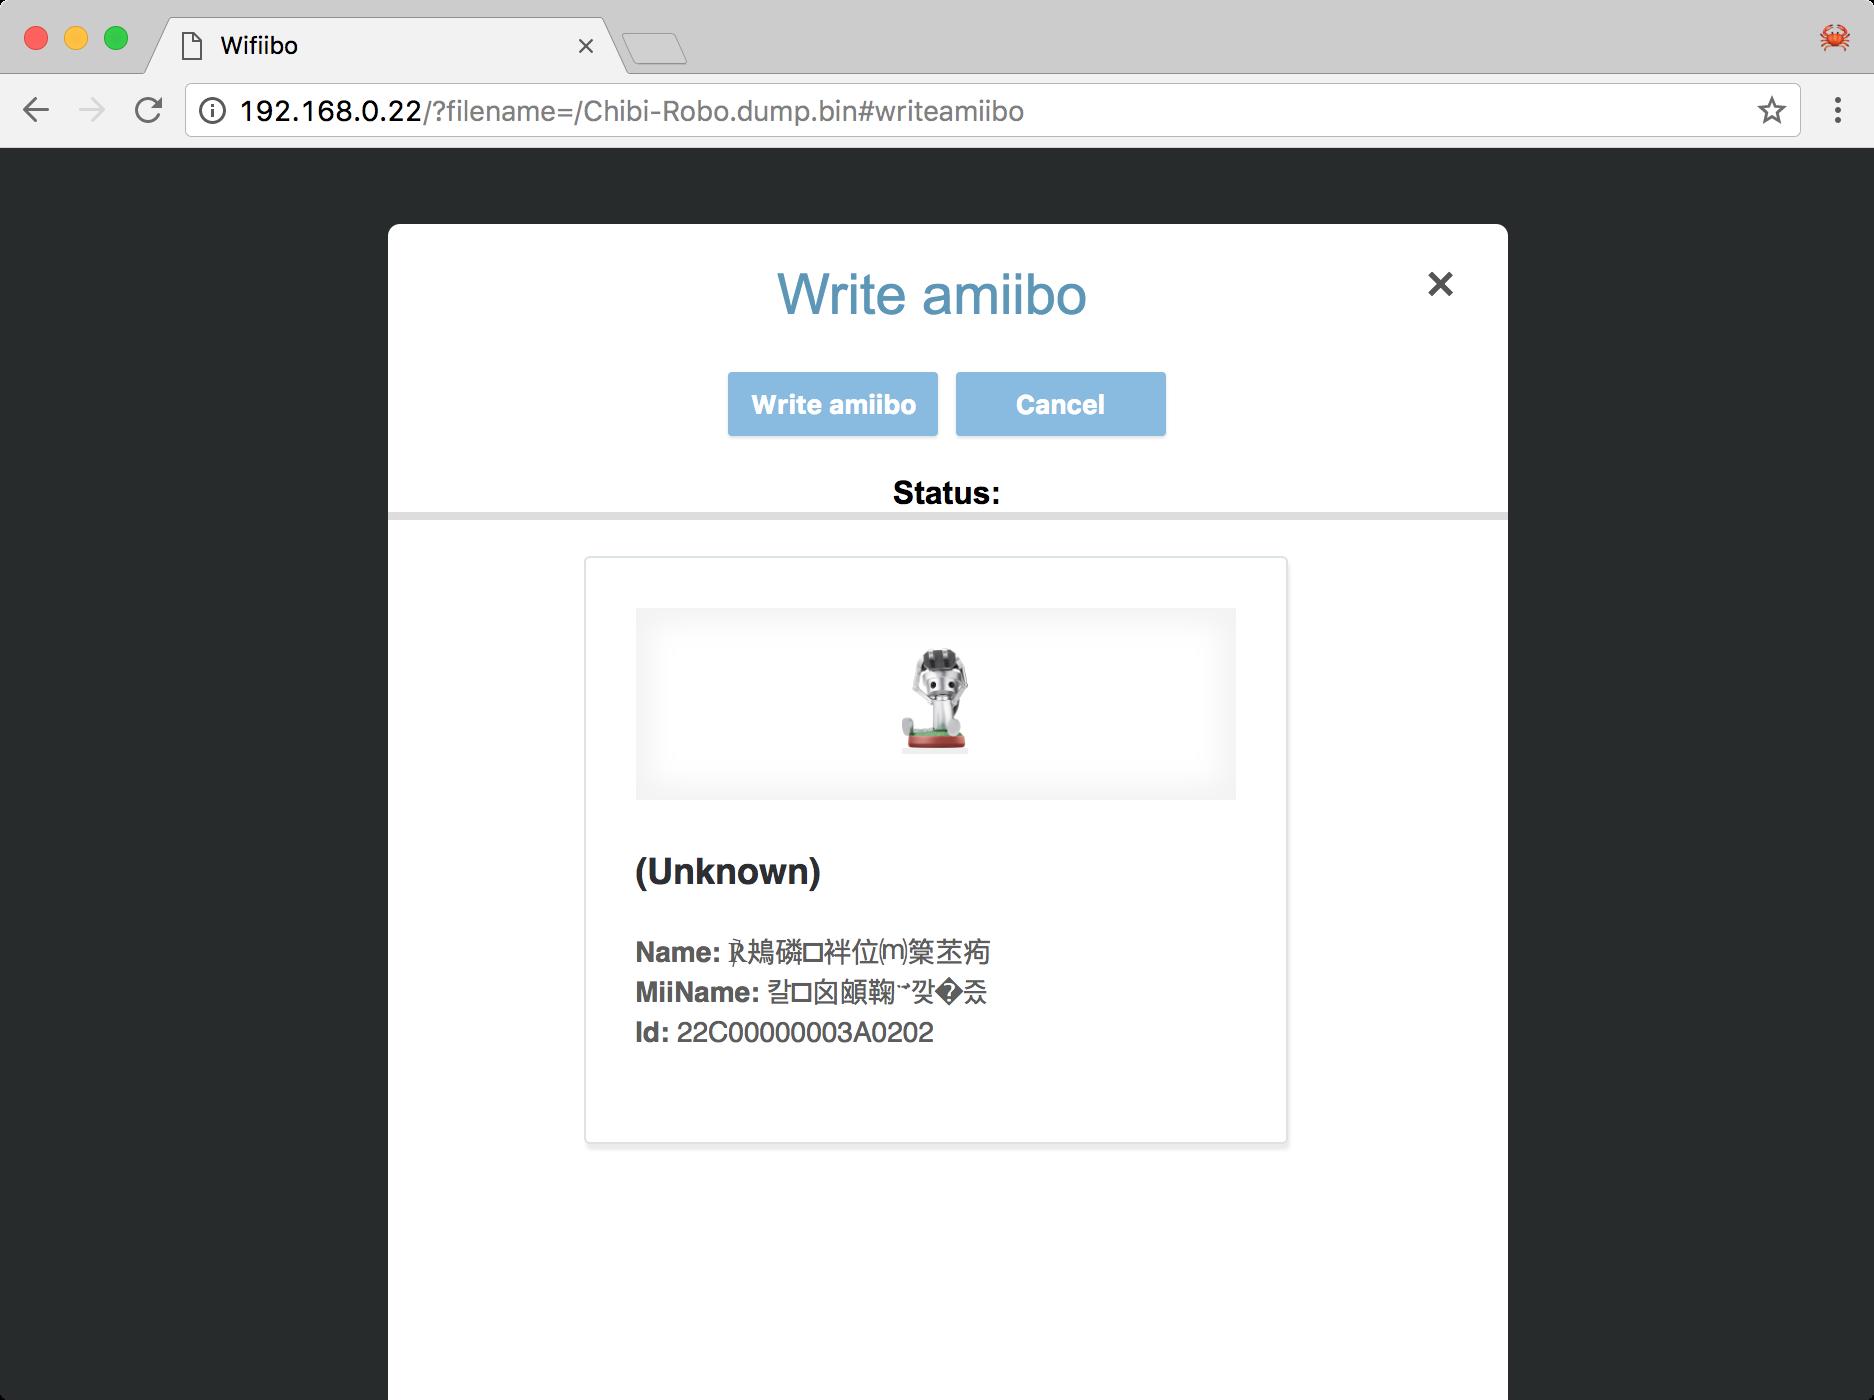 Can't read or write an amiibo · Issue #1 · Xerxes3rd/Wifiibo